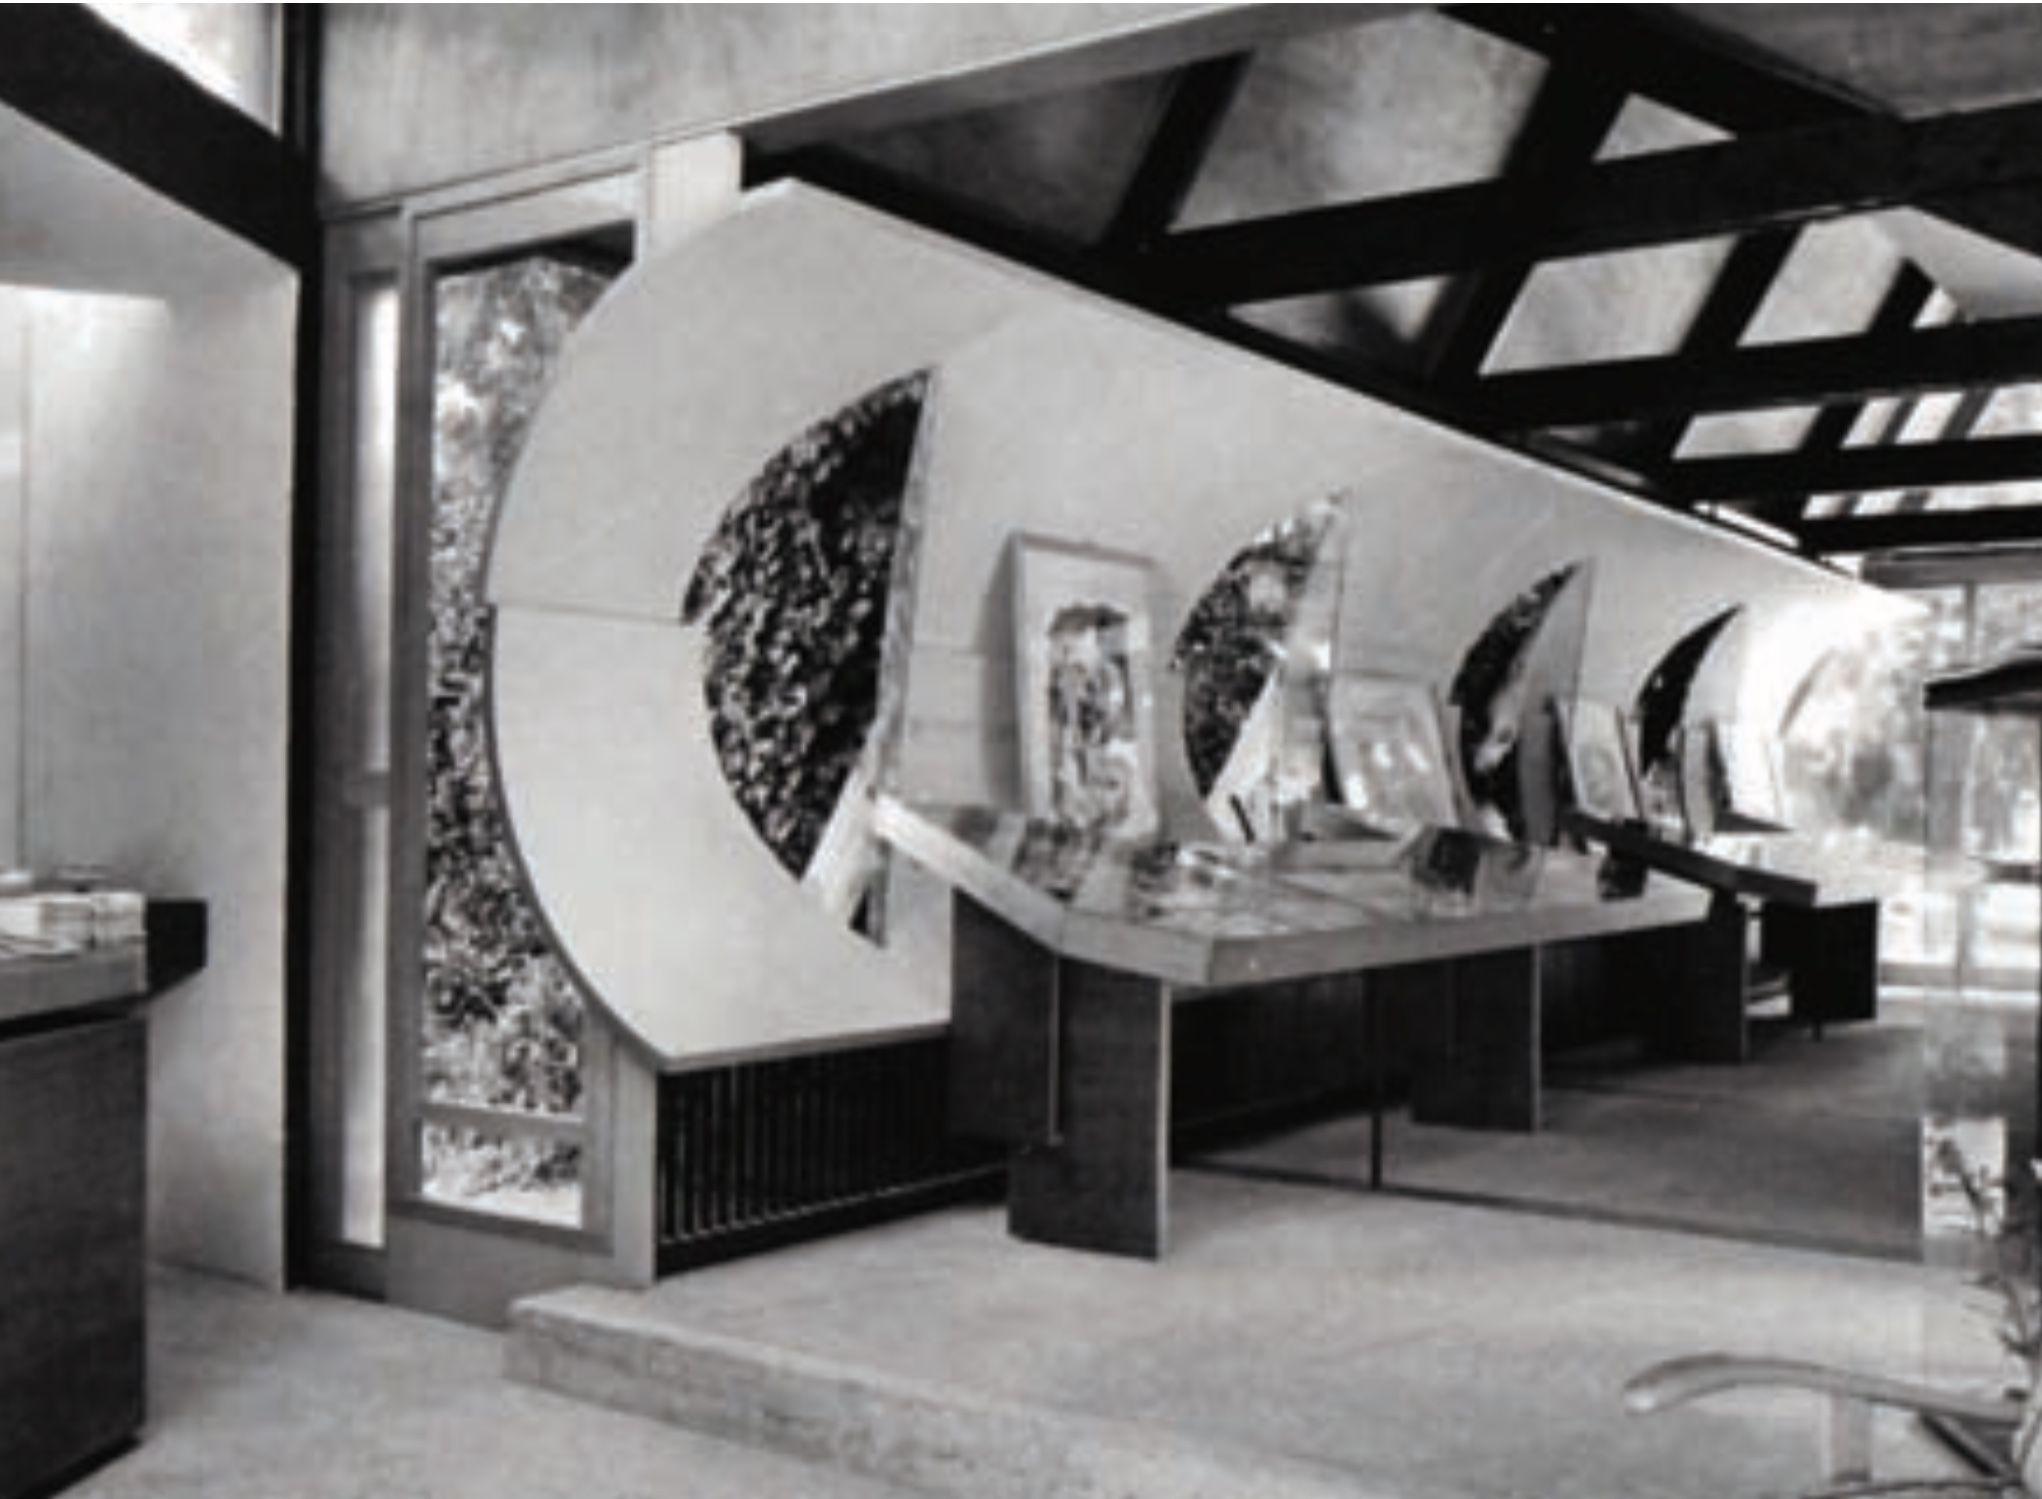 Carlo Scarpa's Giardini book pavilion (July 195012.05